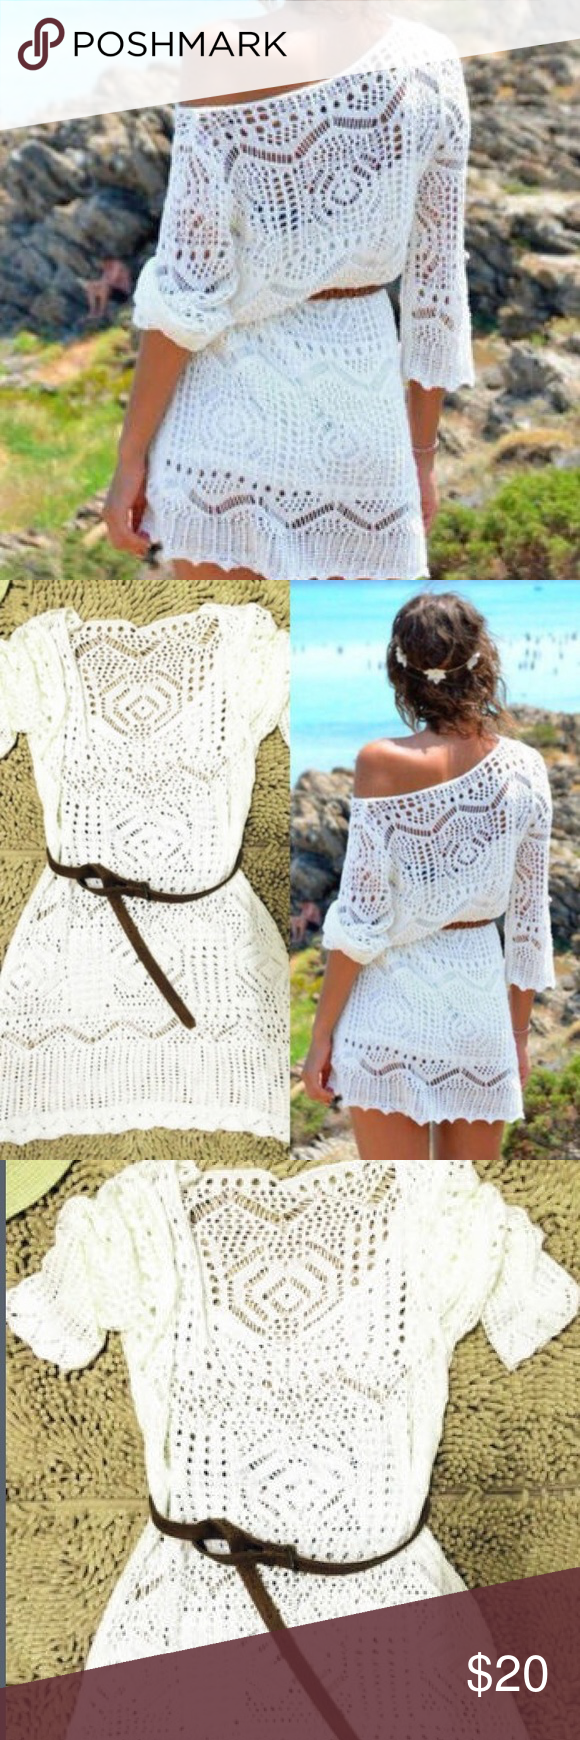 8744a5e23319e COMING SOON Sexy Boho style dress Fashion Womens White Summer Boho Sexy  Lace Hollow Knit Bikini Swimwear Cover up Crochet Beach Mini Dress Tops  Blouse ...